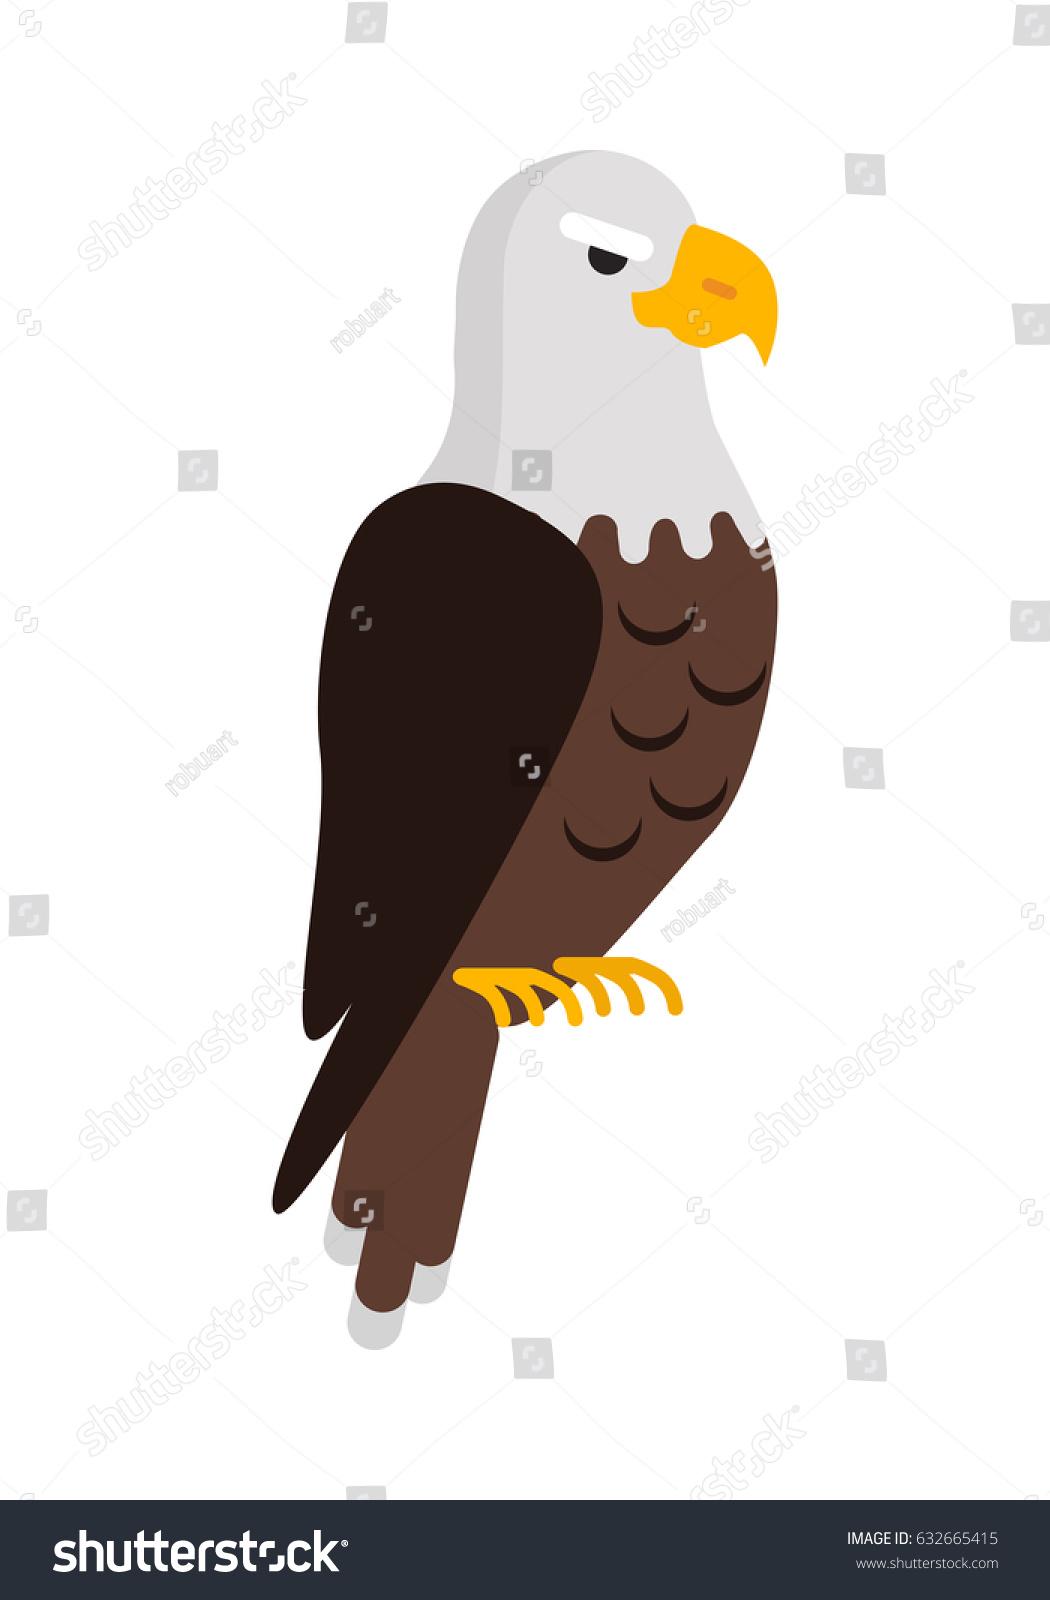 eagle large bird prey cartoon isolated stock vector 632665415